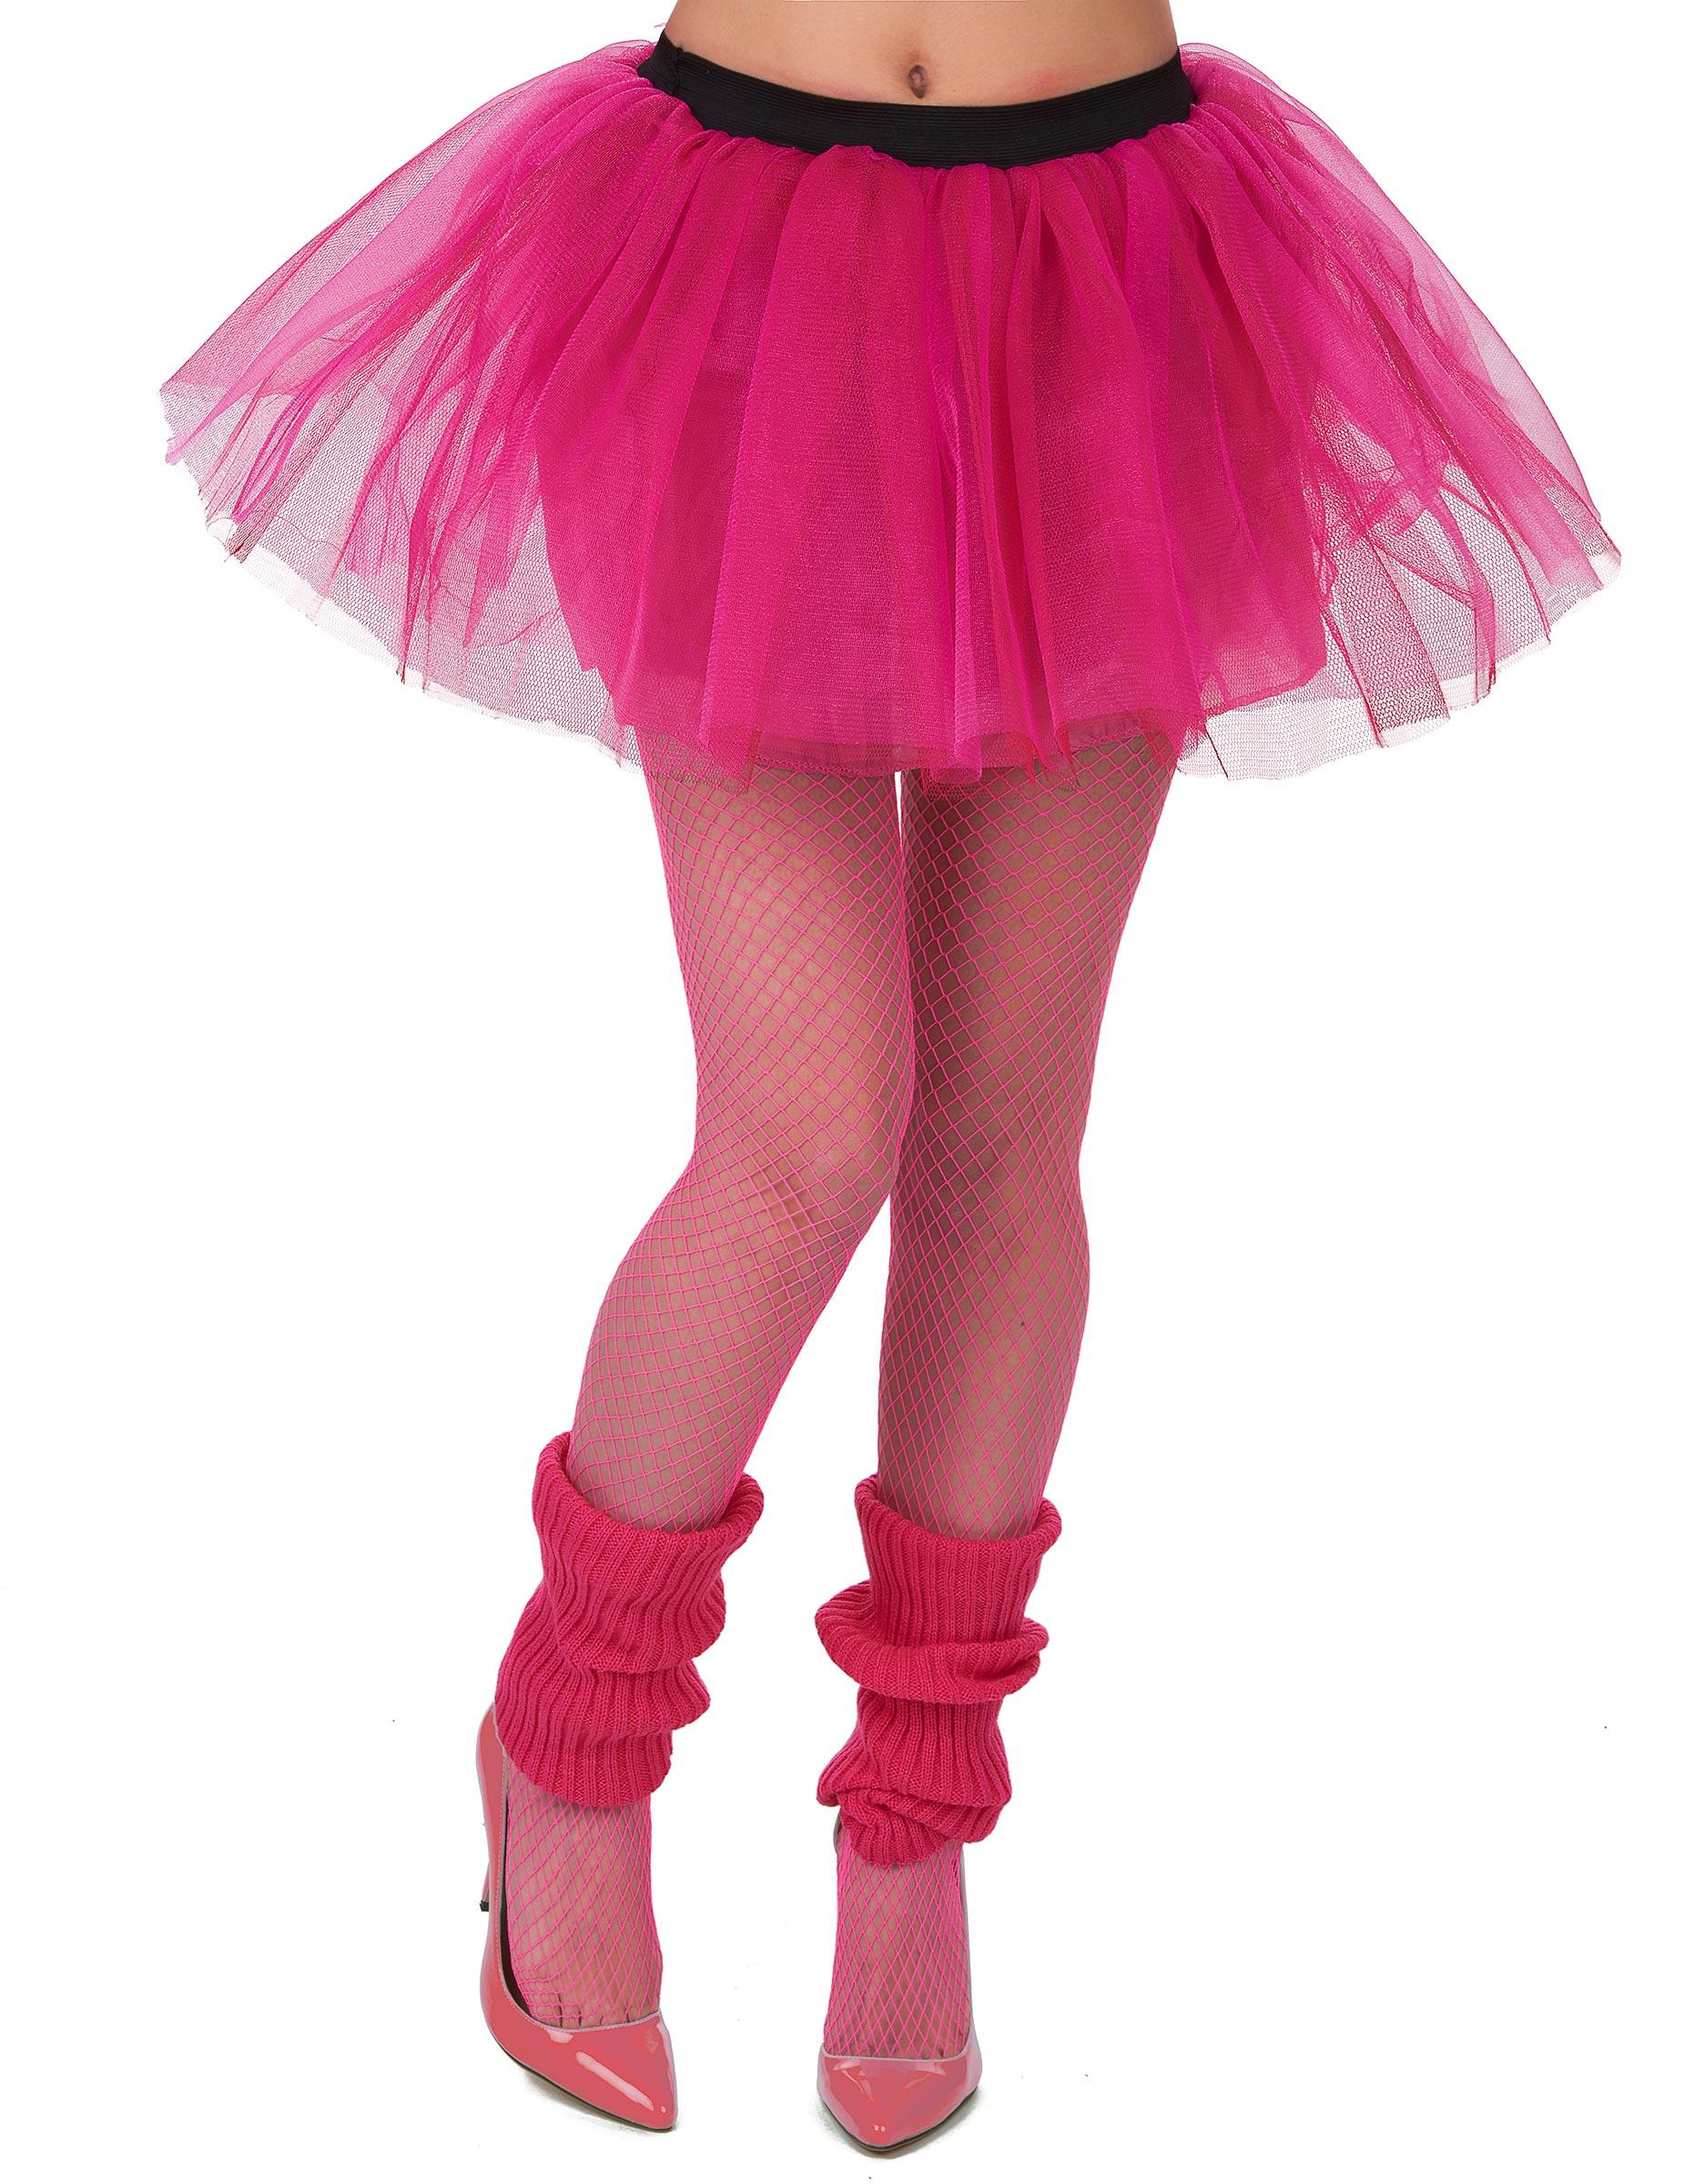 Tutu rose fluo femme   Deguise-toi 442fe3d2195